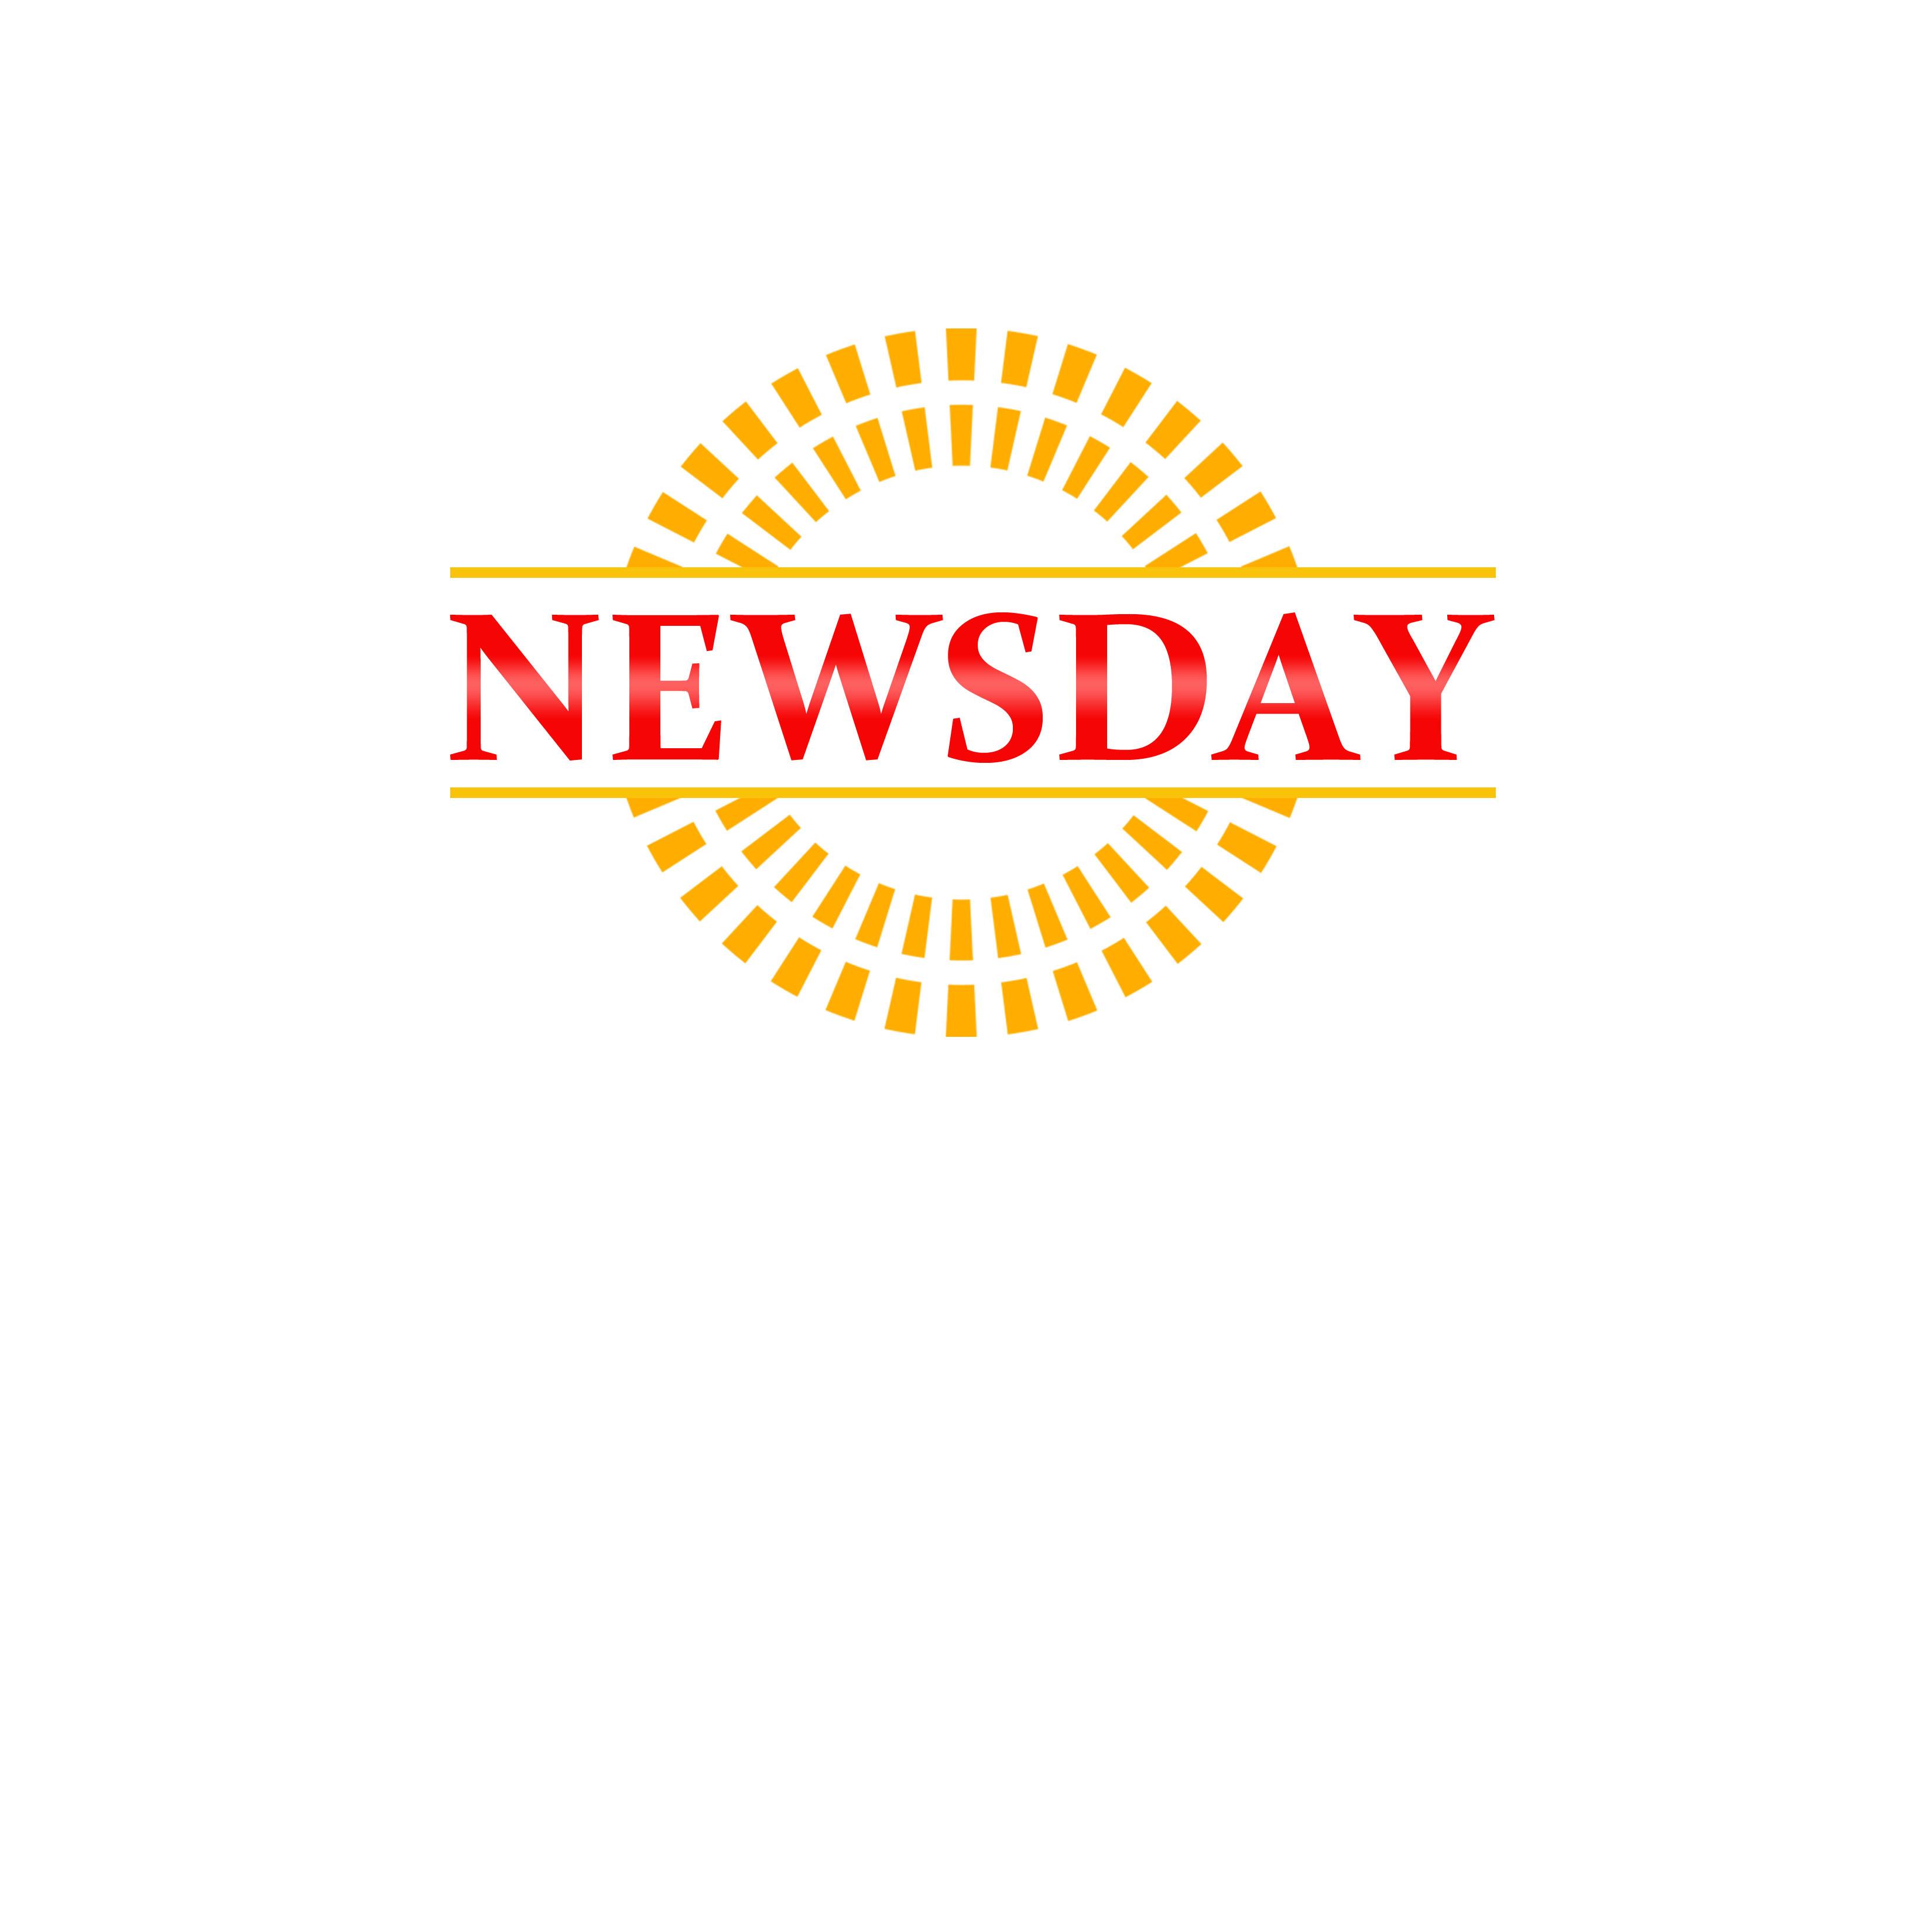 Logo Design by Allan Esclamado - Entry No. 42 in the Logo Design Contest Artistic Logo Design for Newsday.